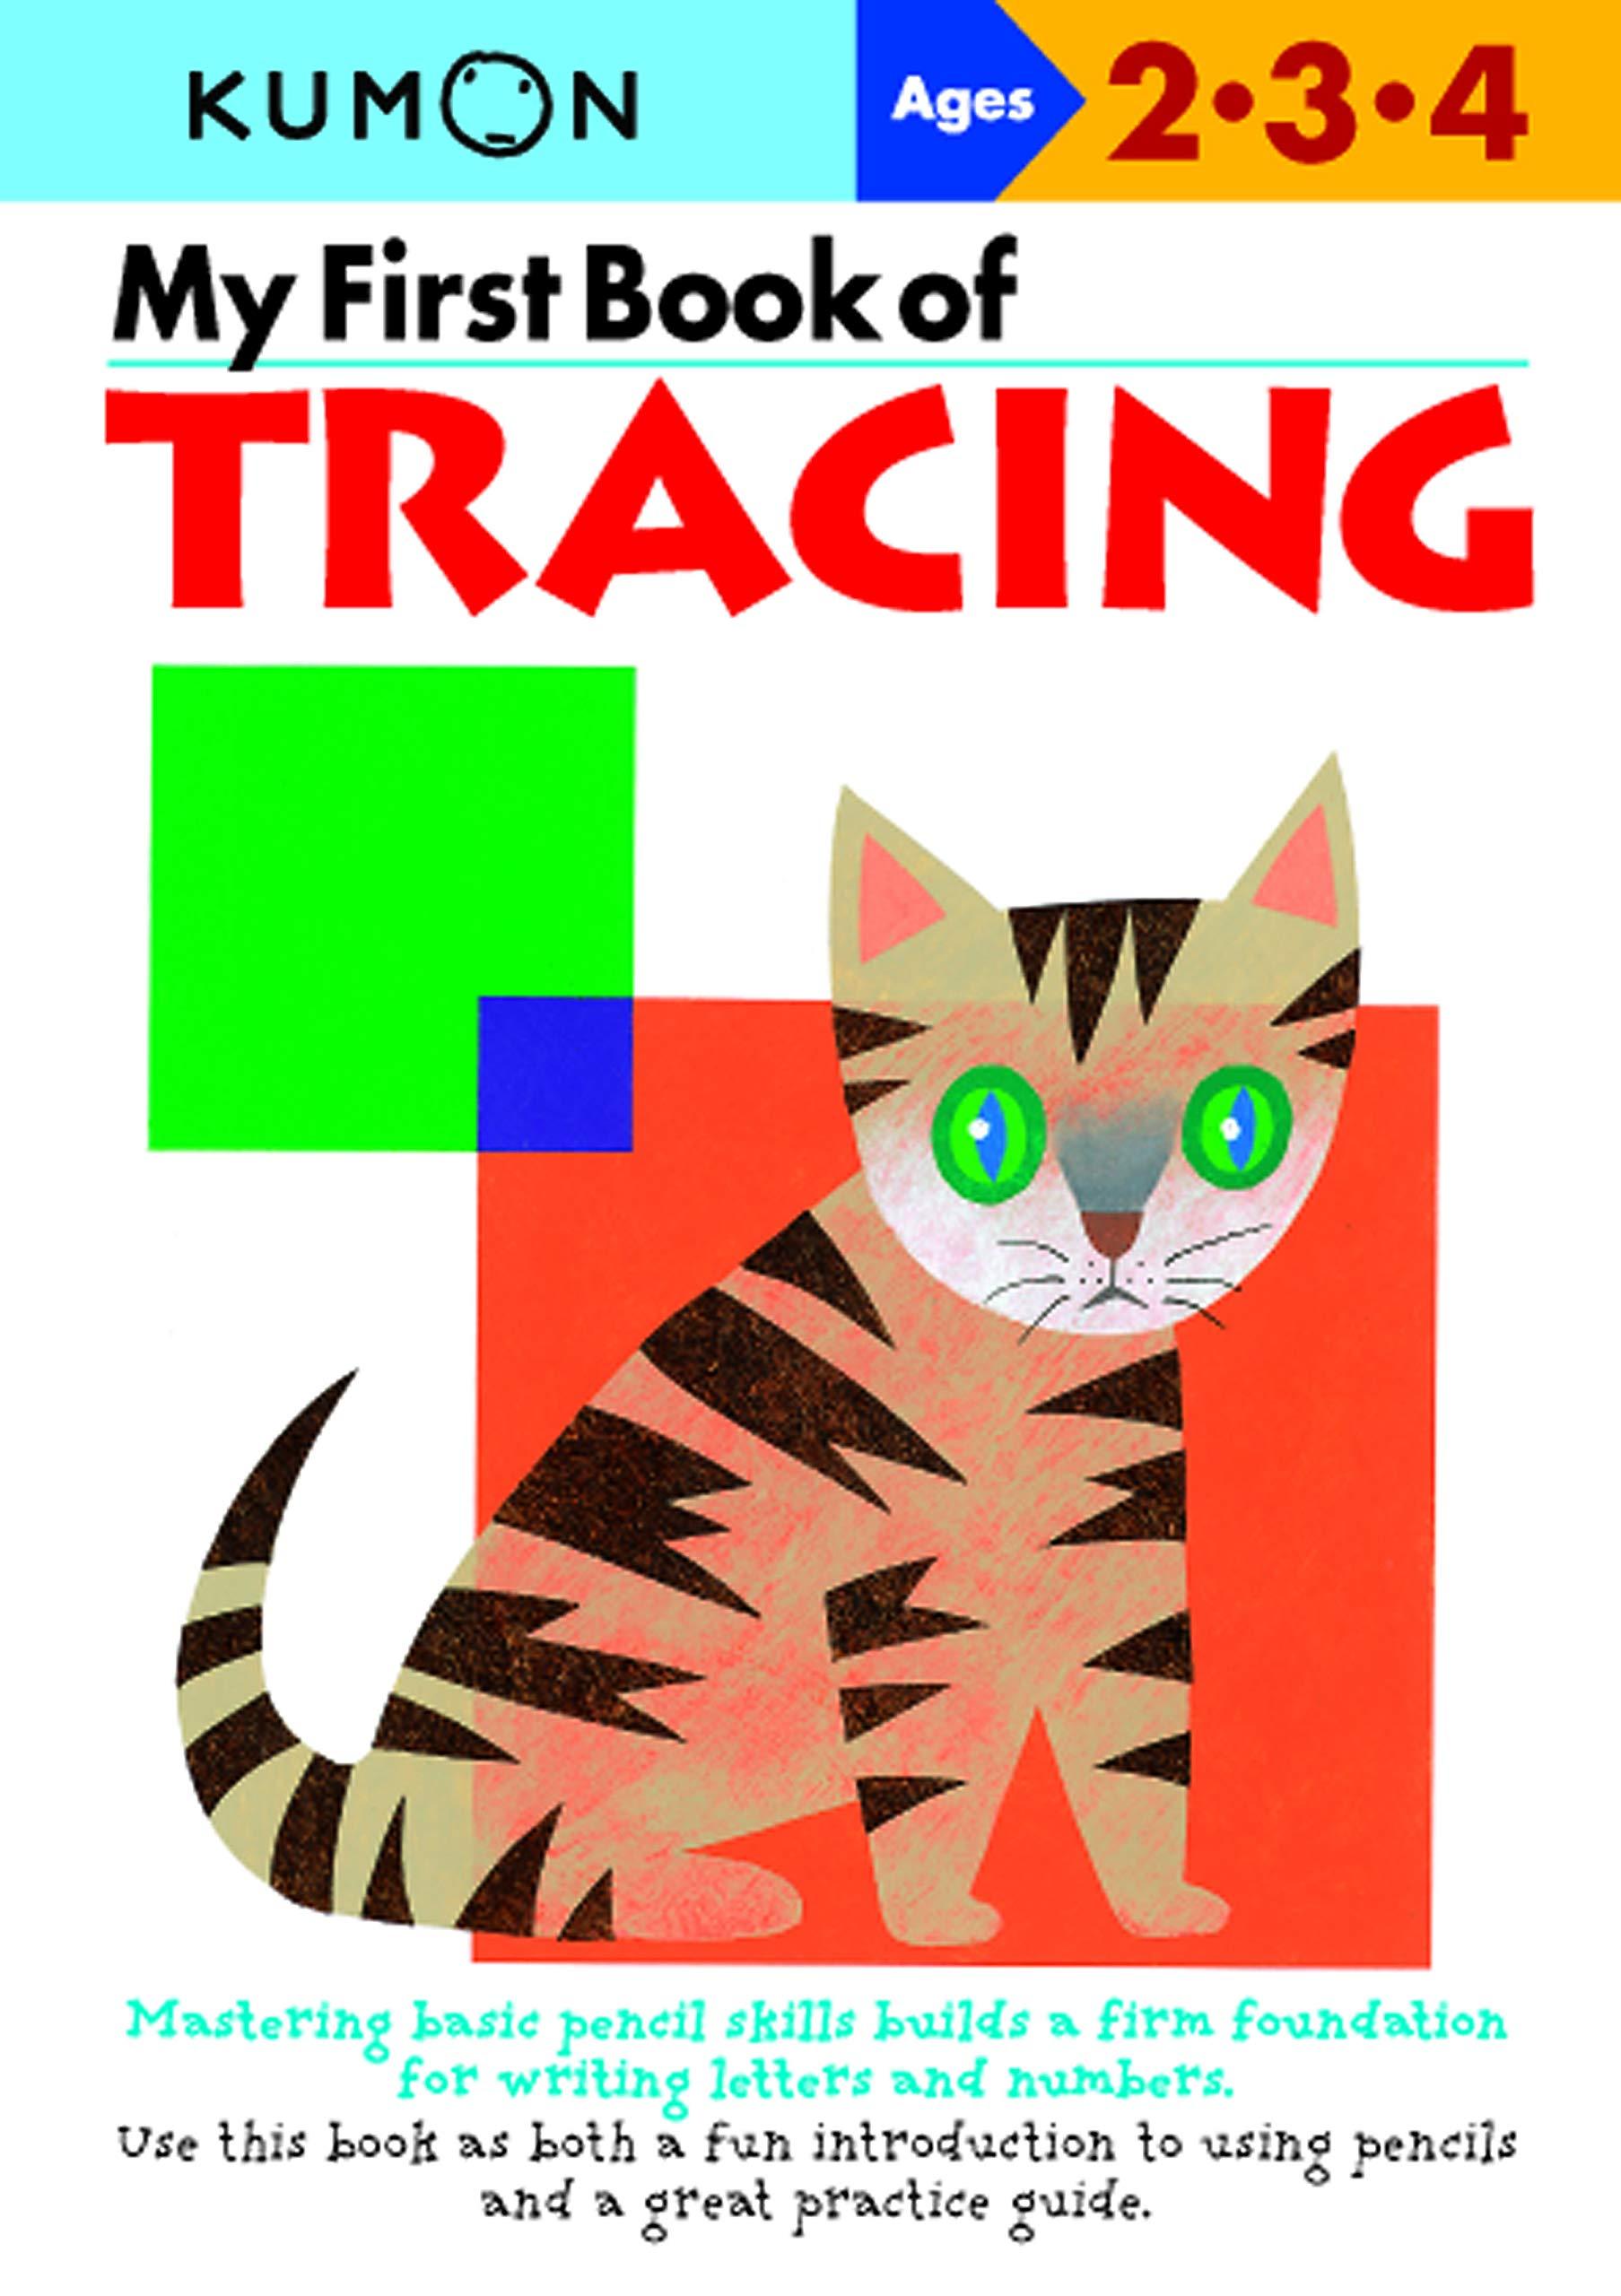 My First Book Of Tracing Kumon Kumon Kumon 9784774307077 Books Amazon Ca [ 2560 x 1807 Pixel ]